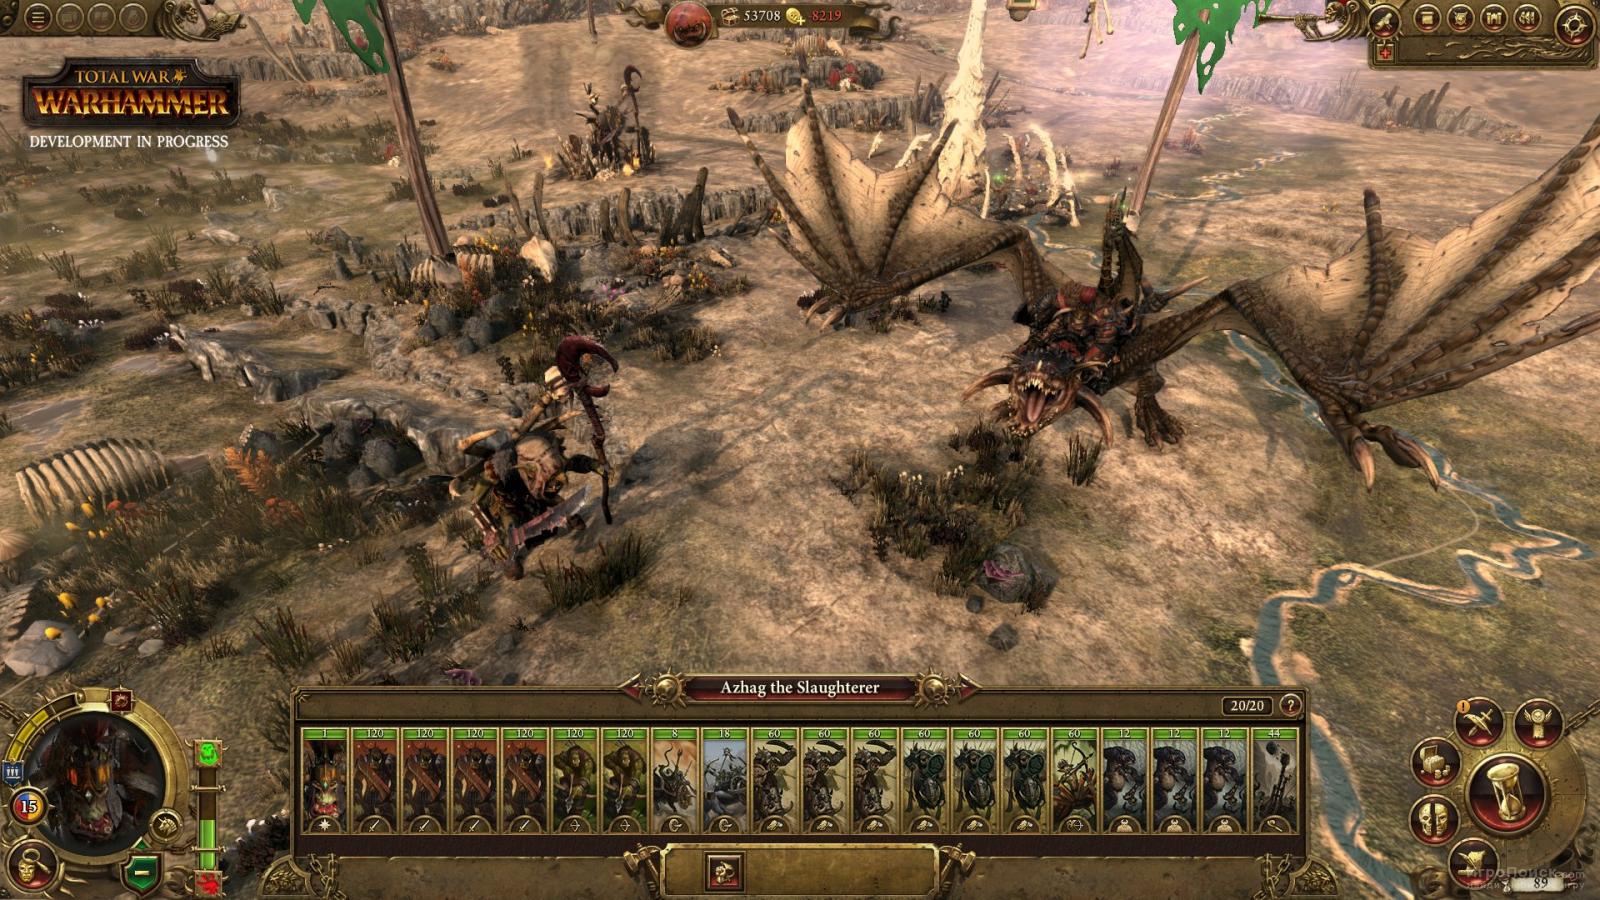 Скриншот к игре Total War: Warhammer